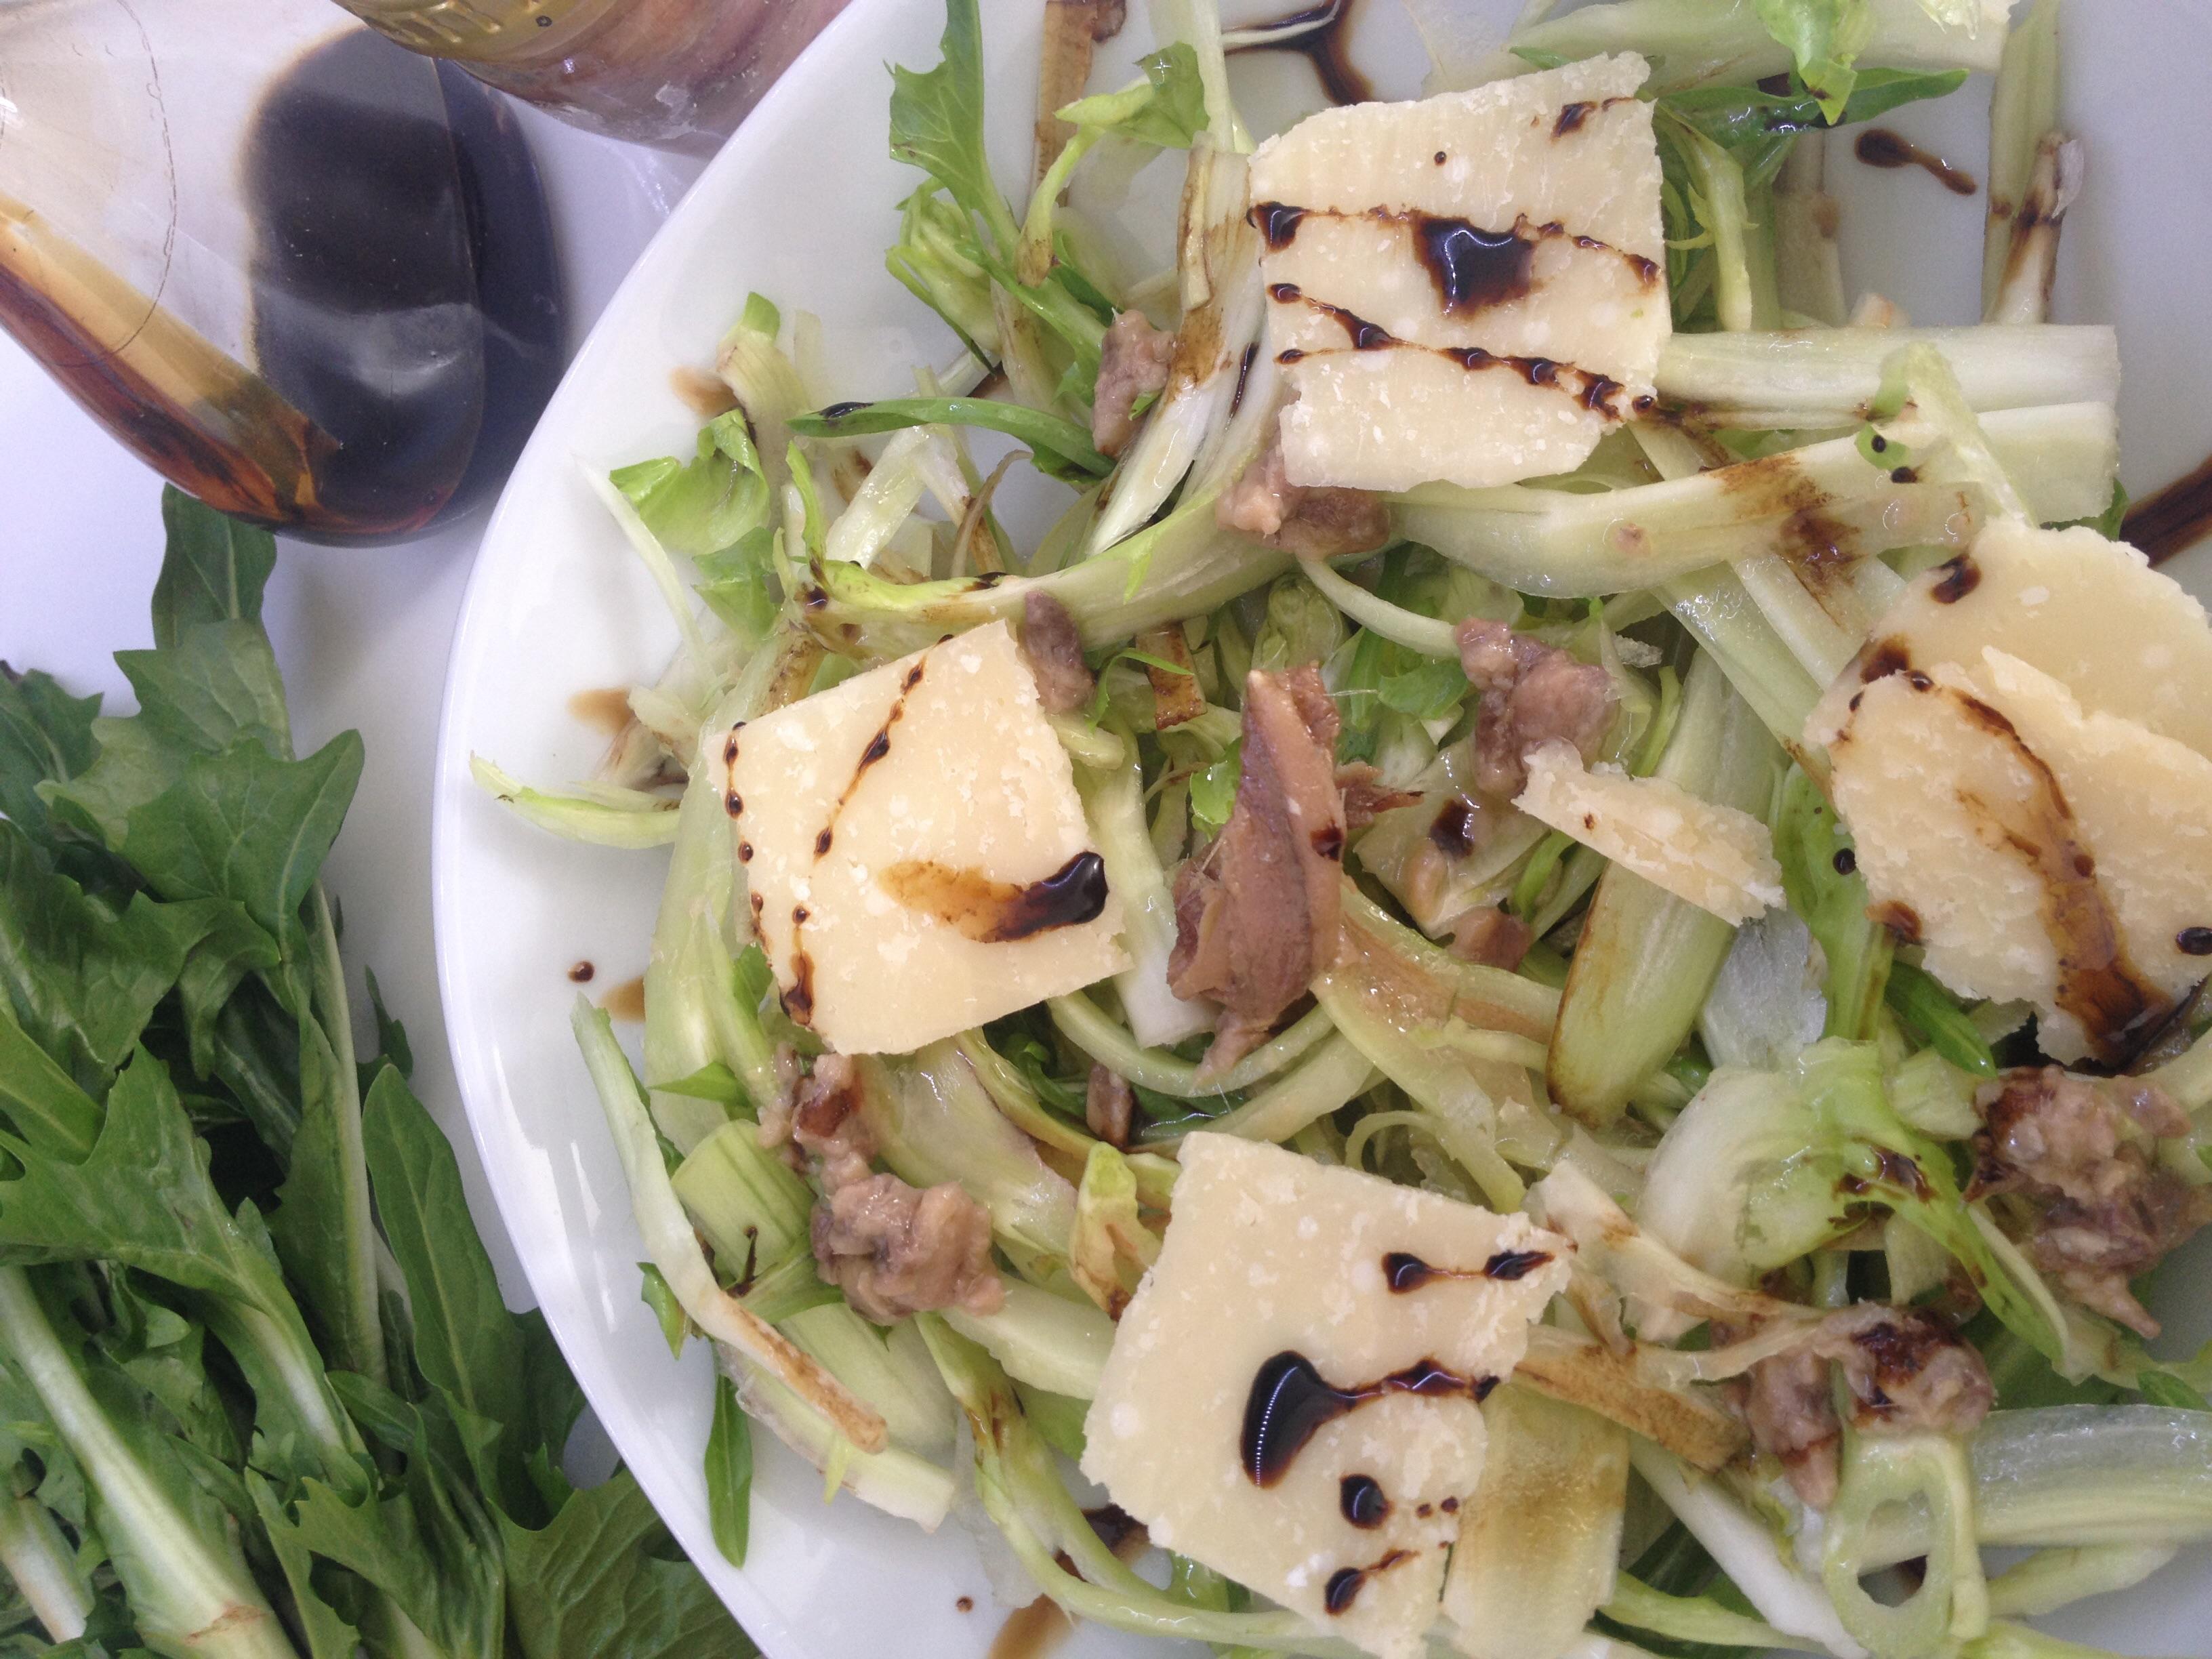 Puntarelle in insalata